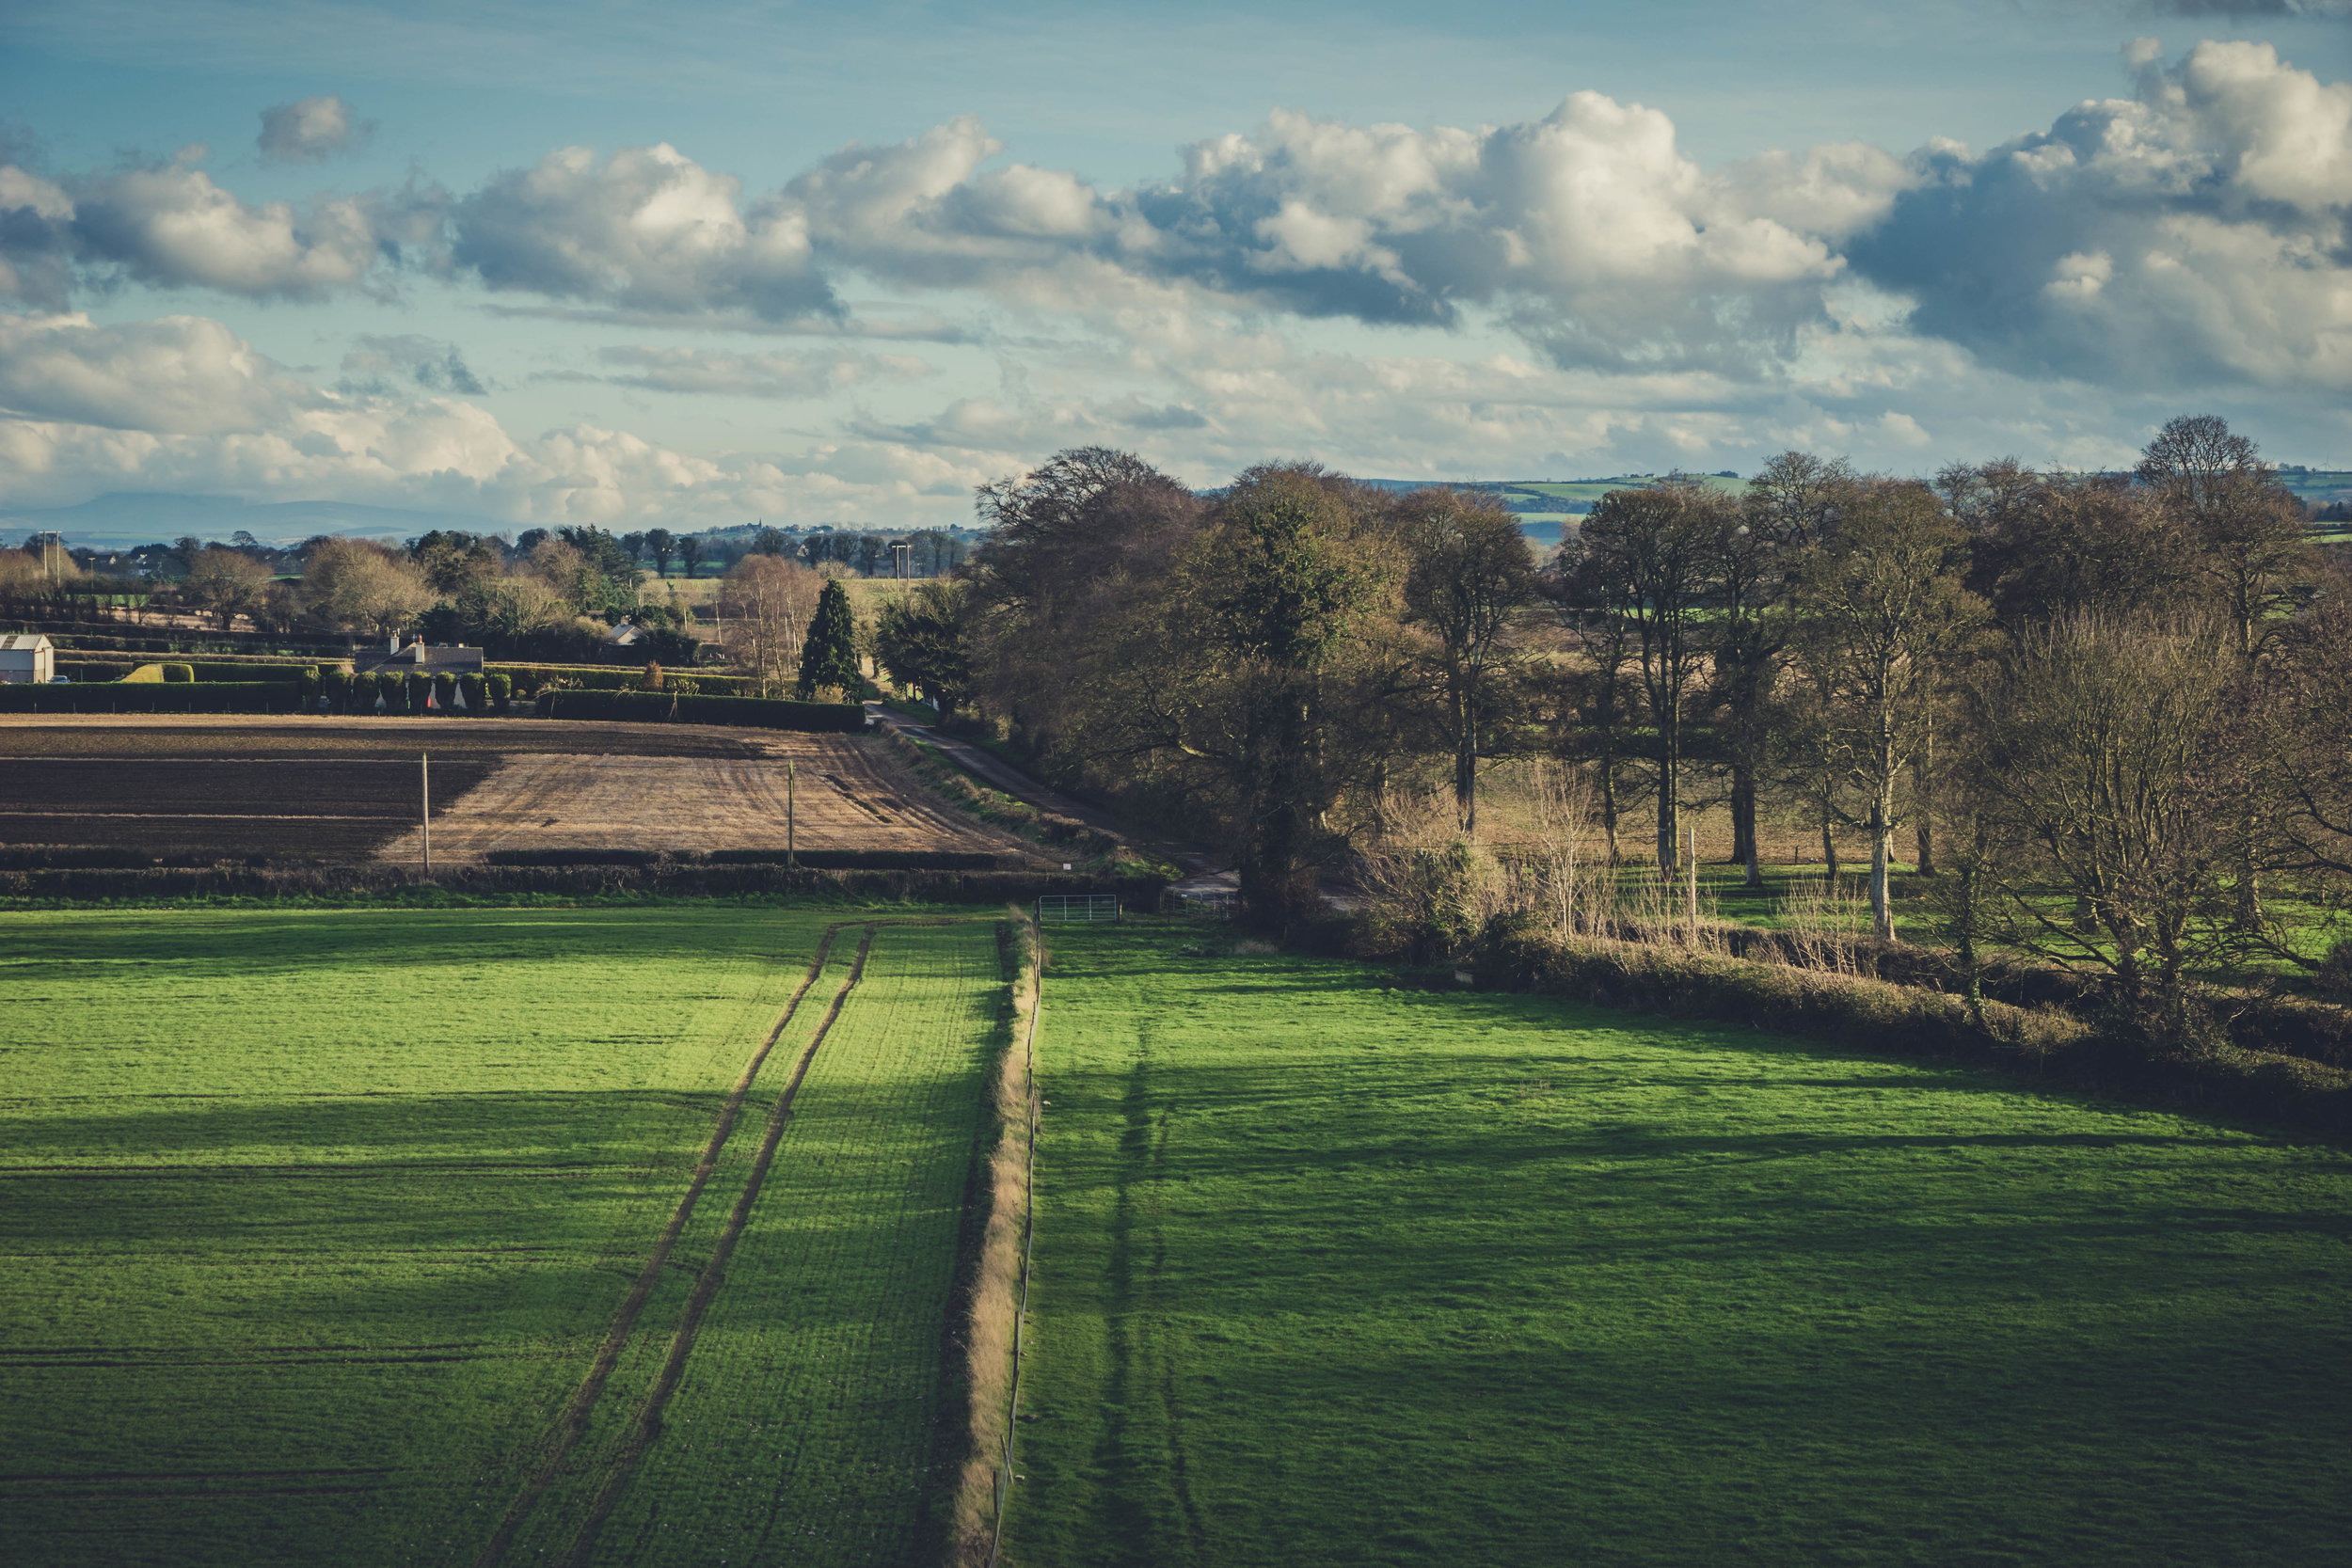 Ireland. Castle. Old castle. irish history. history. Rock of Dunamase. blue sky. rock. pathway. adventure. travel. irish counrty. green fields..jpg